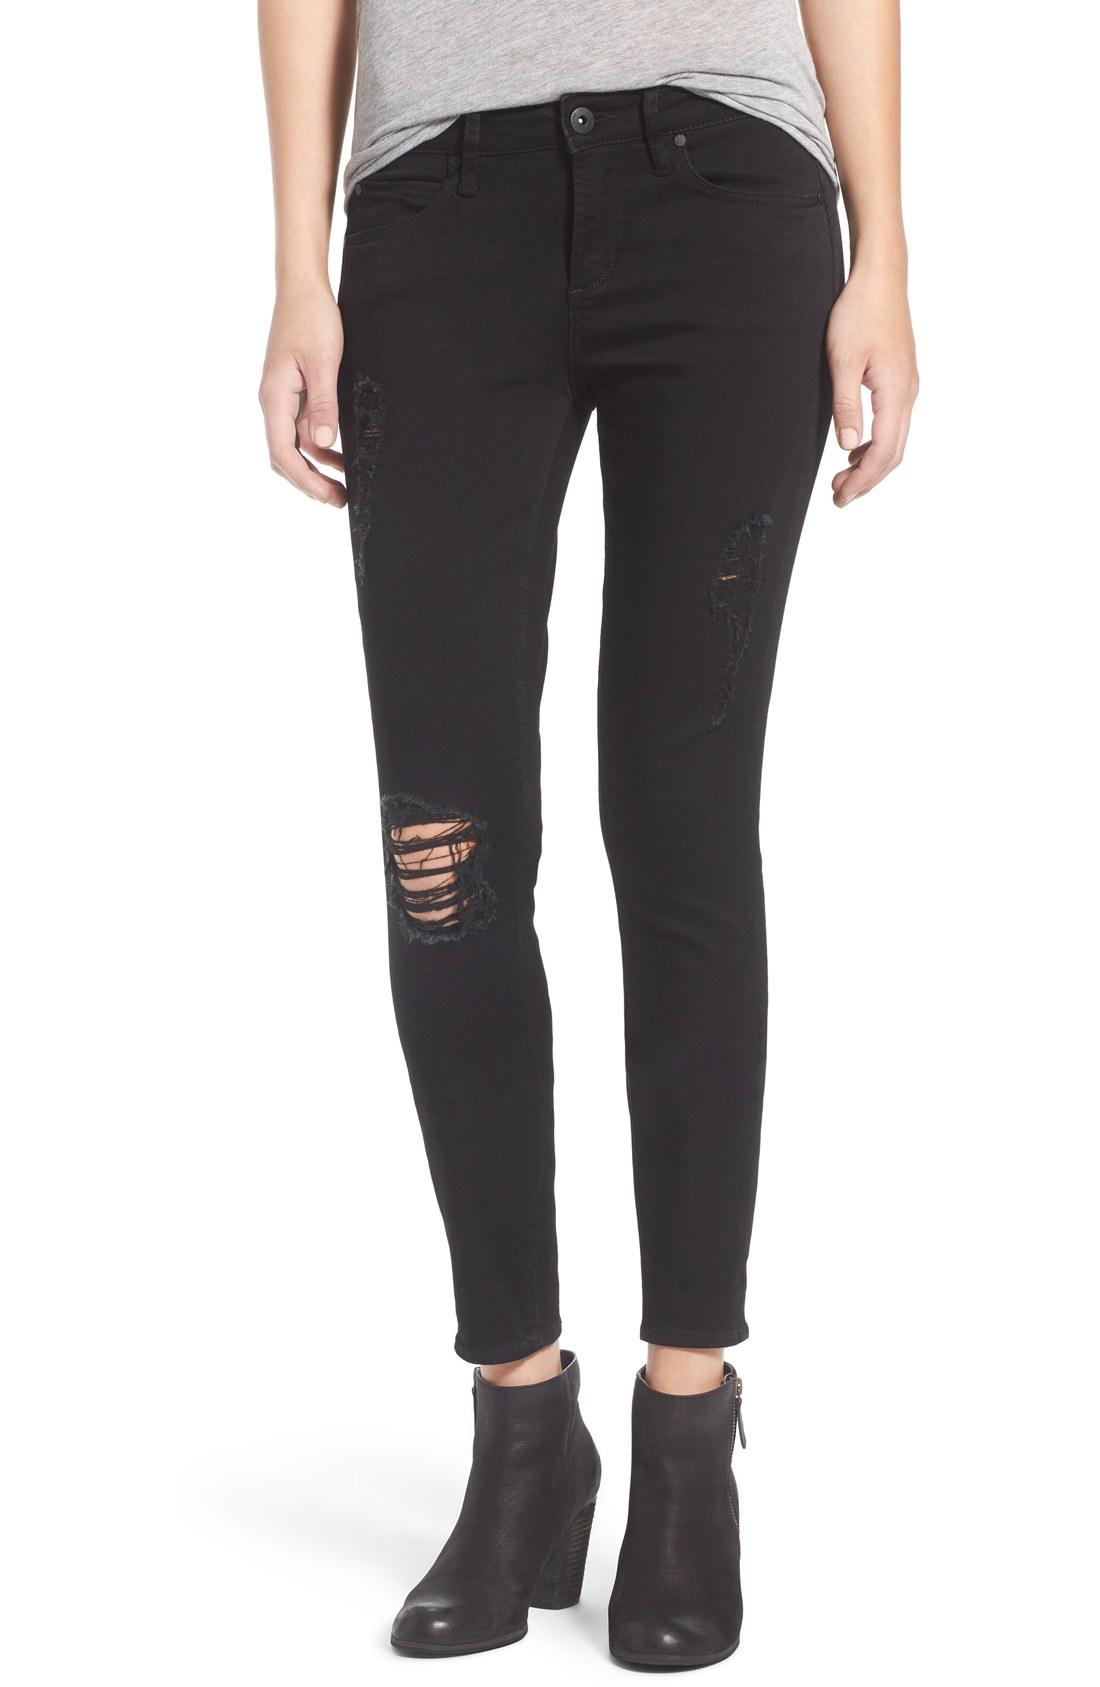 black skinny jeans articles of society u0027sarahu0027 skinny jeans (black cast) | nordstrom GIPDYQY